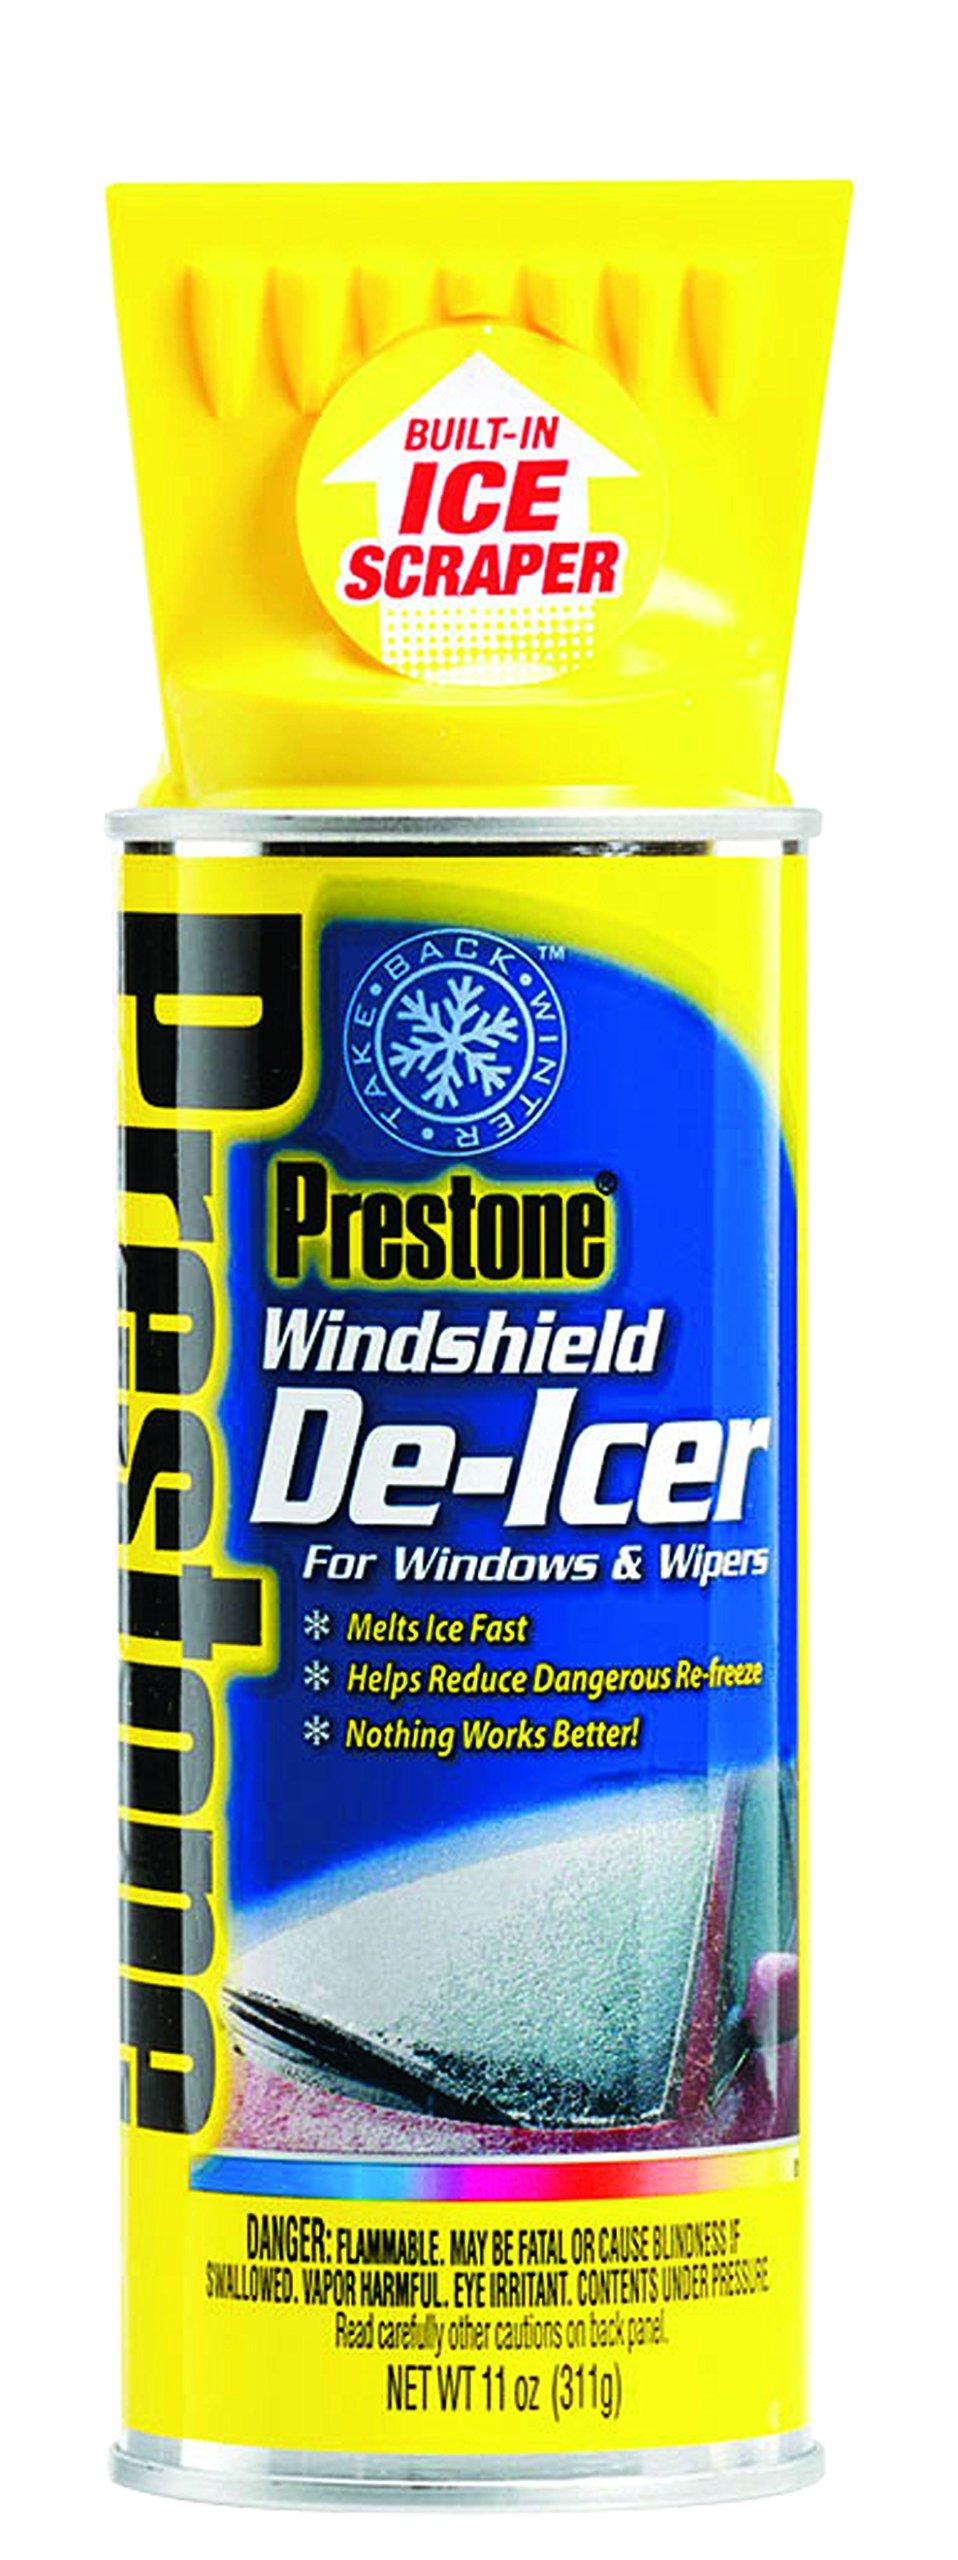 Prestone AS242-6PK Windshield De-Icer - 11 oz. Aerosol, (Pack of 6) by Prestone